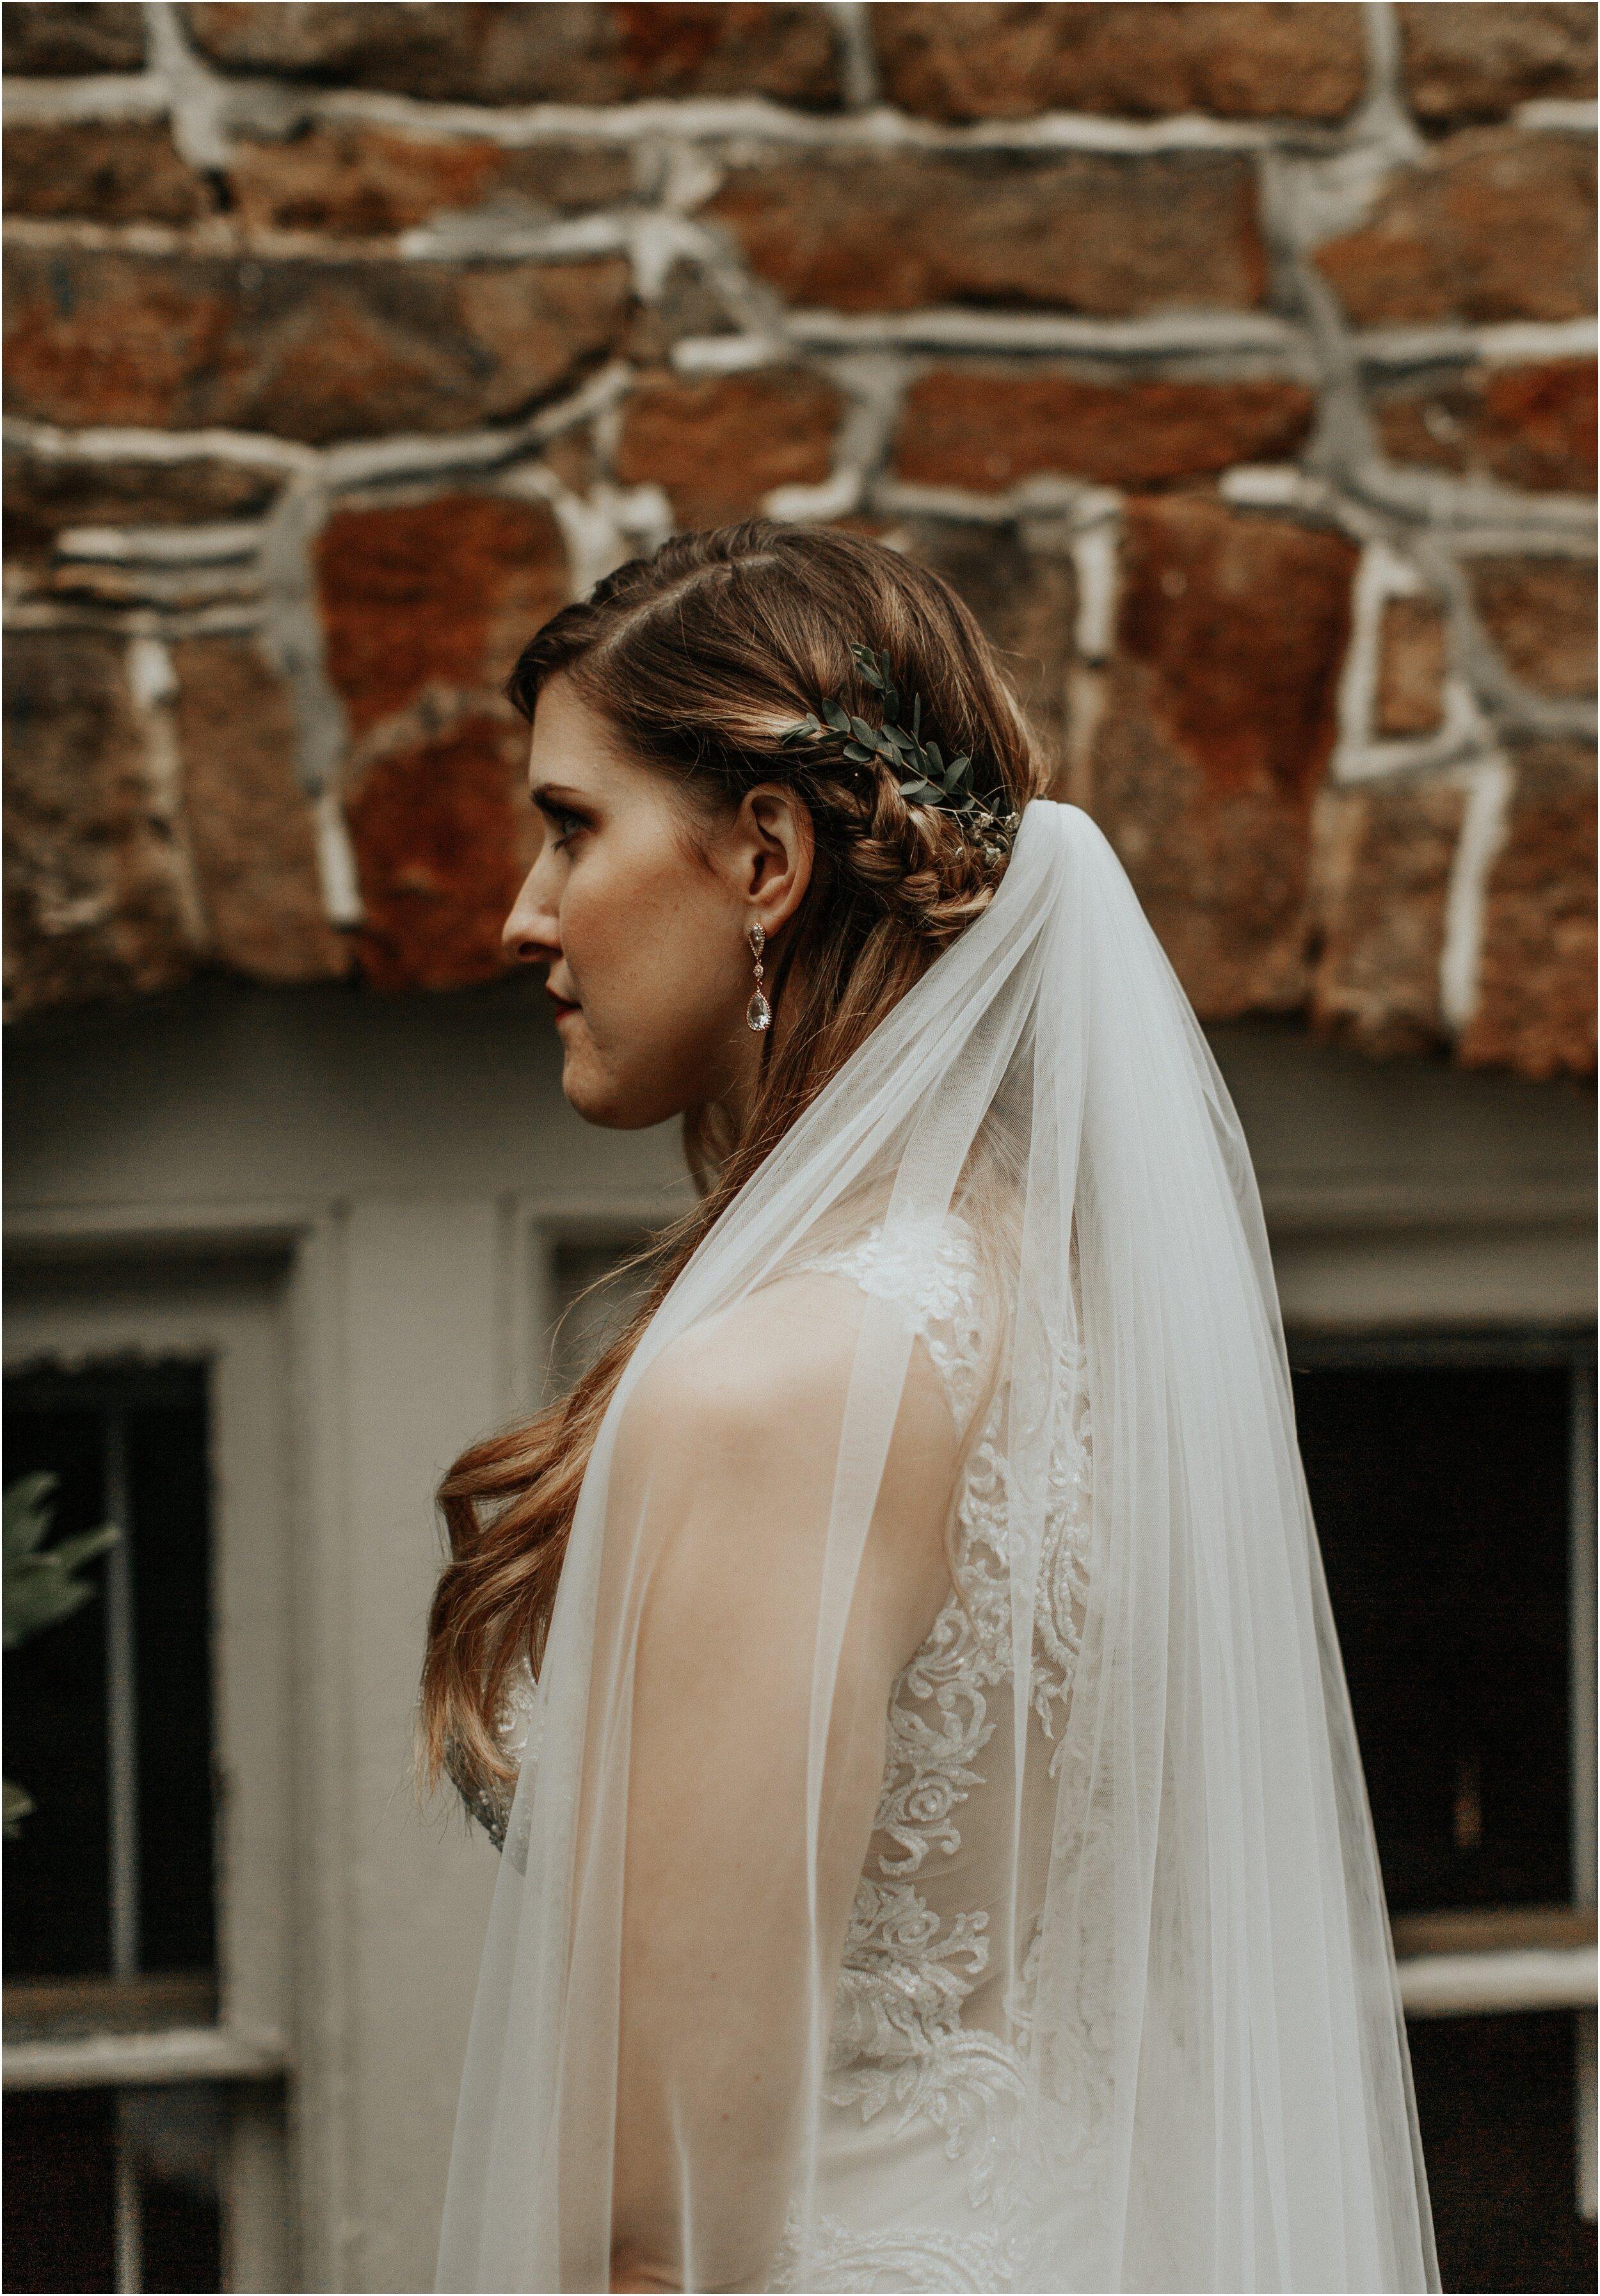 steph-and-jordan-cox-our-wedding-historic-shady-lane-compass-wedding-collective-hazel-lining-photography-destination-elopement-wedding-engagement-photography_0021.jpg